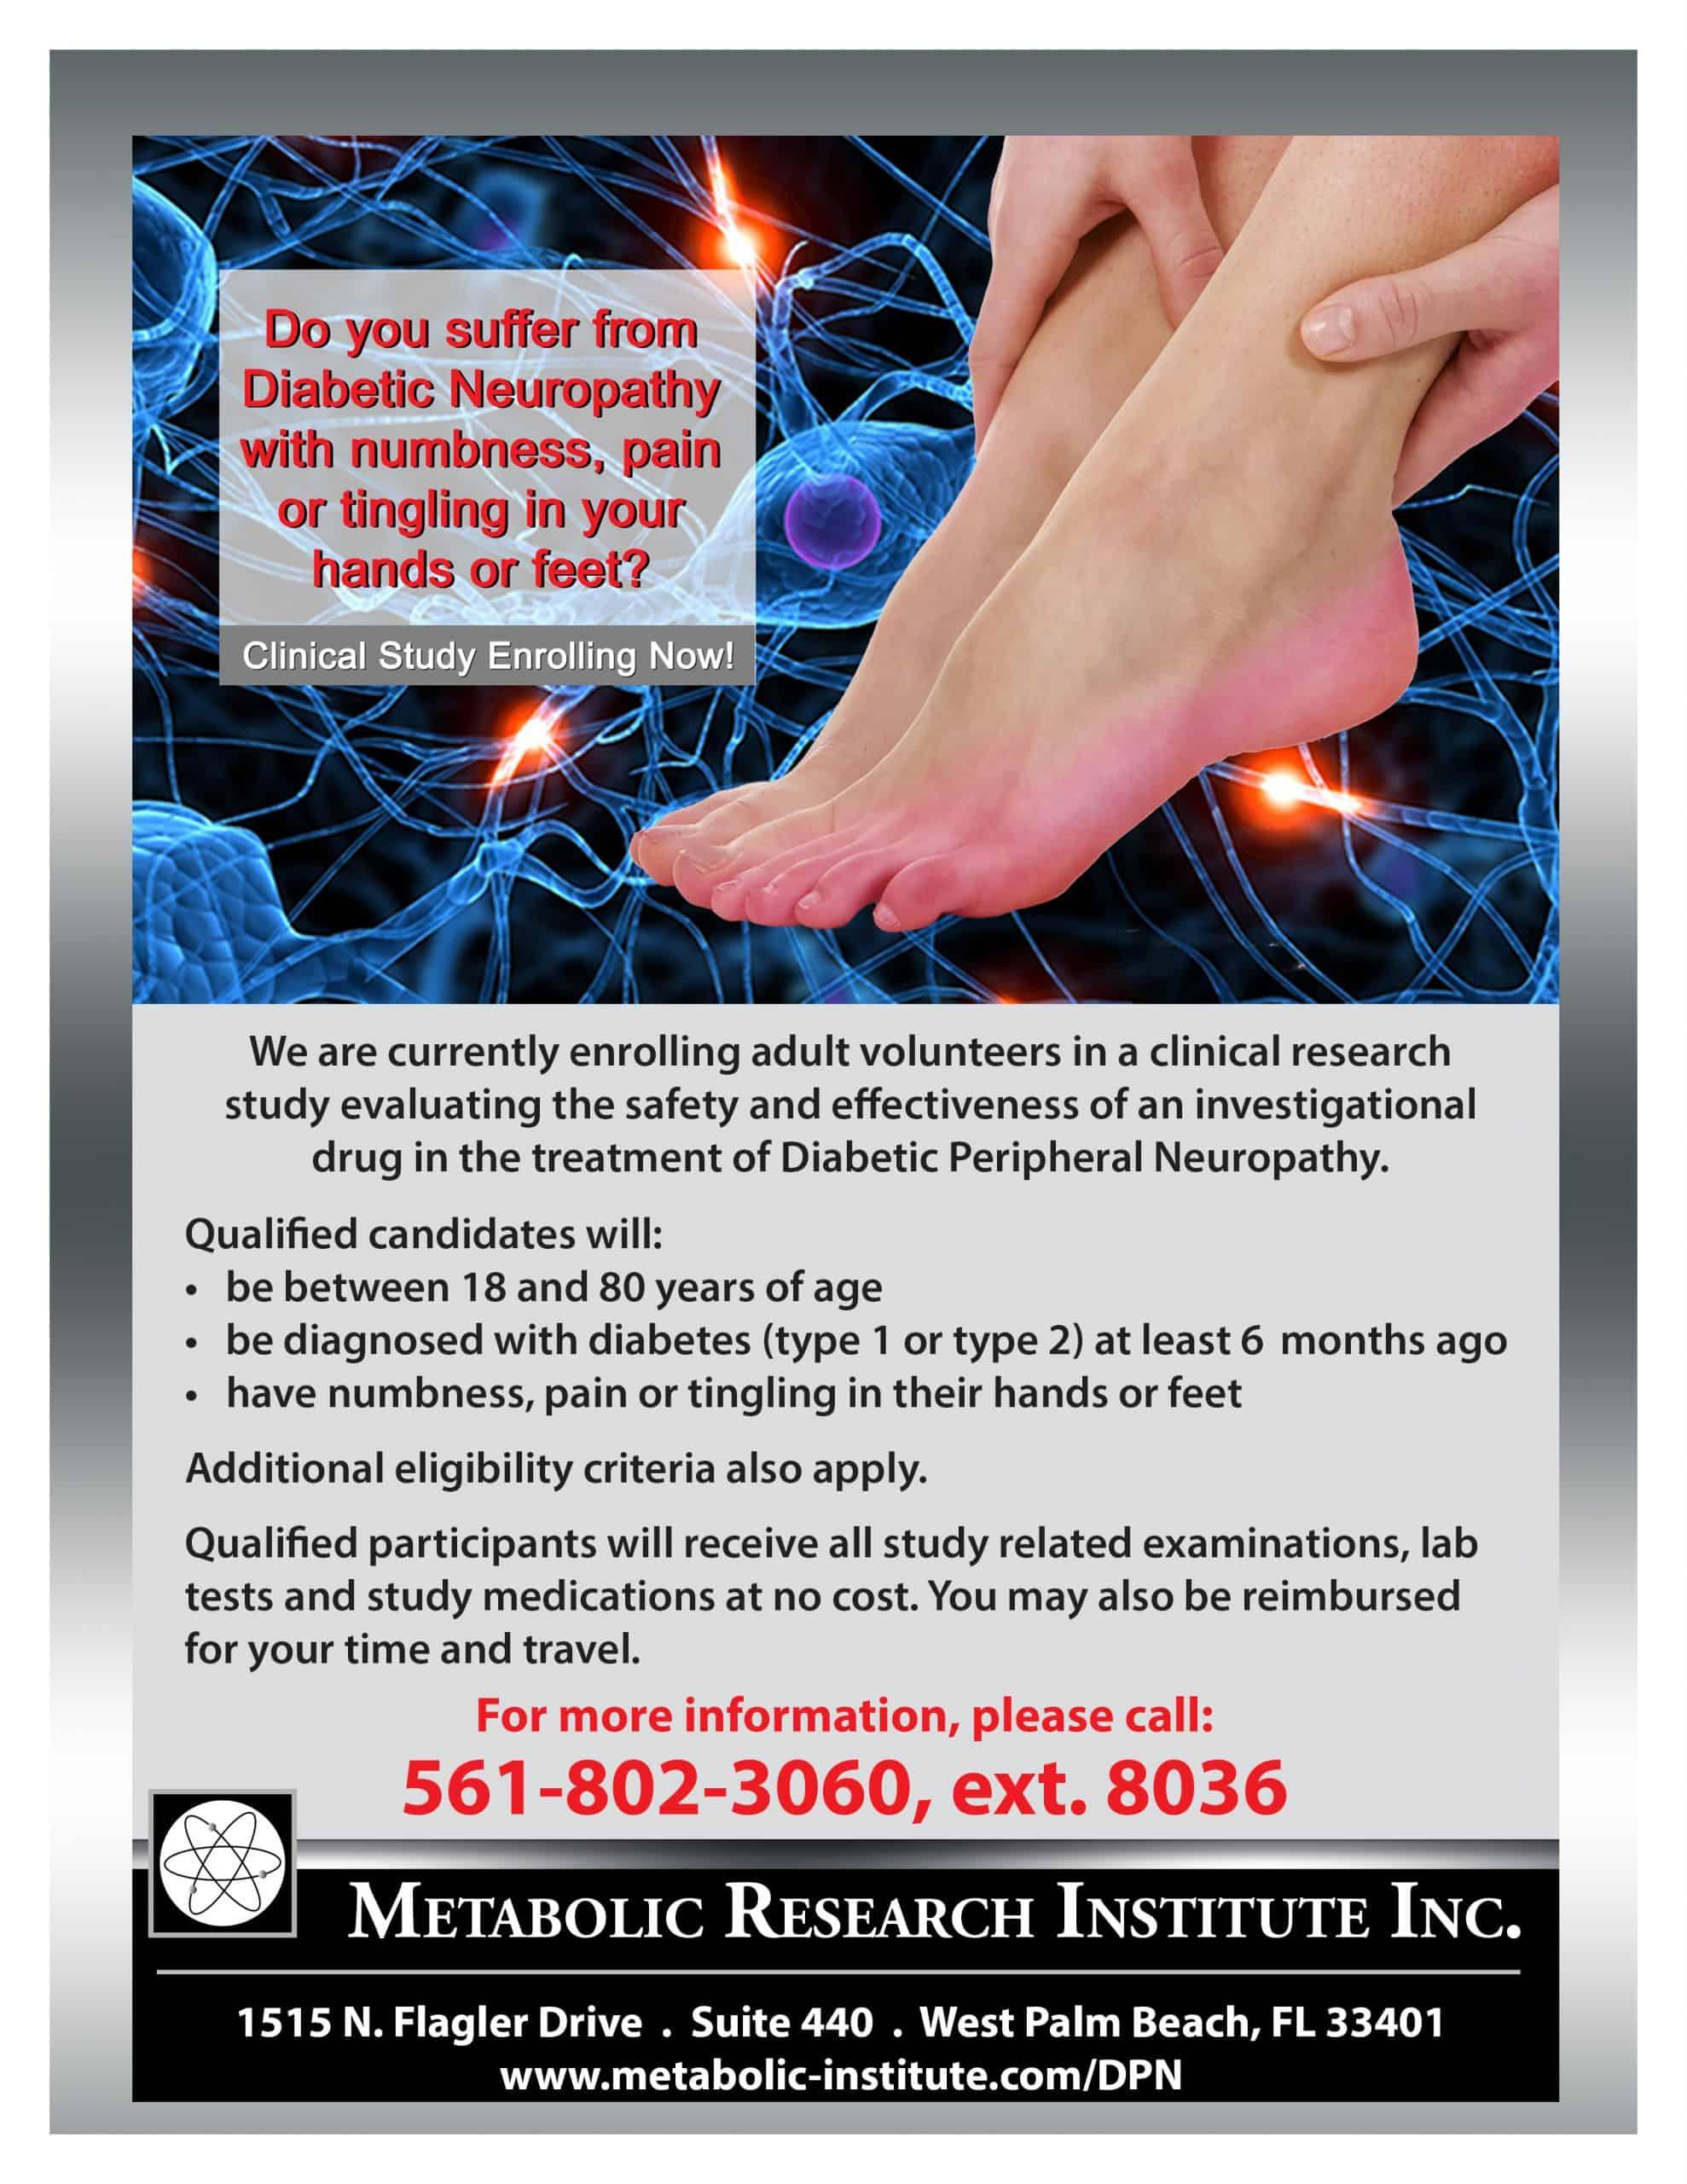 Diabetic Peripheral Neuropathy (DPN) Study Flyer